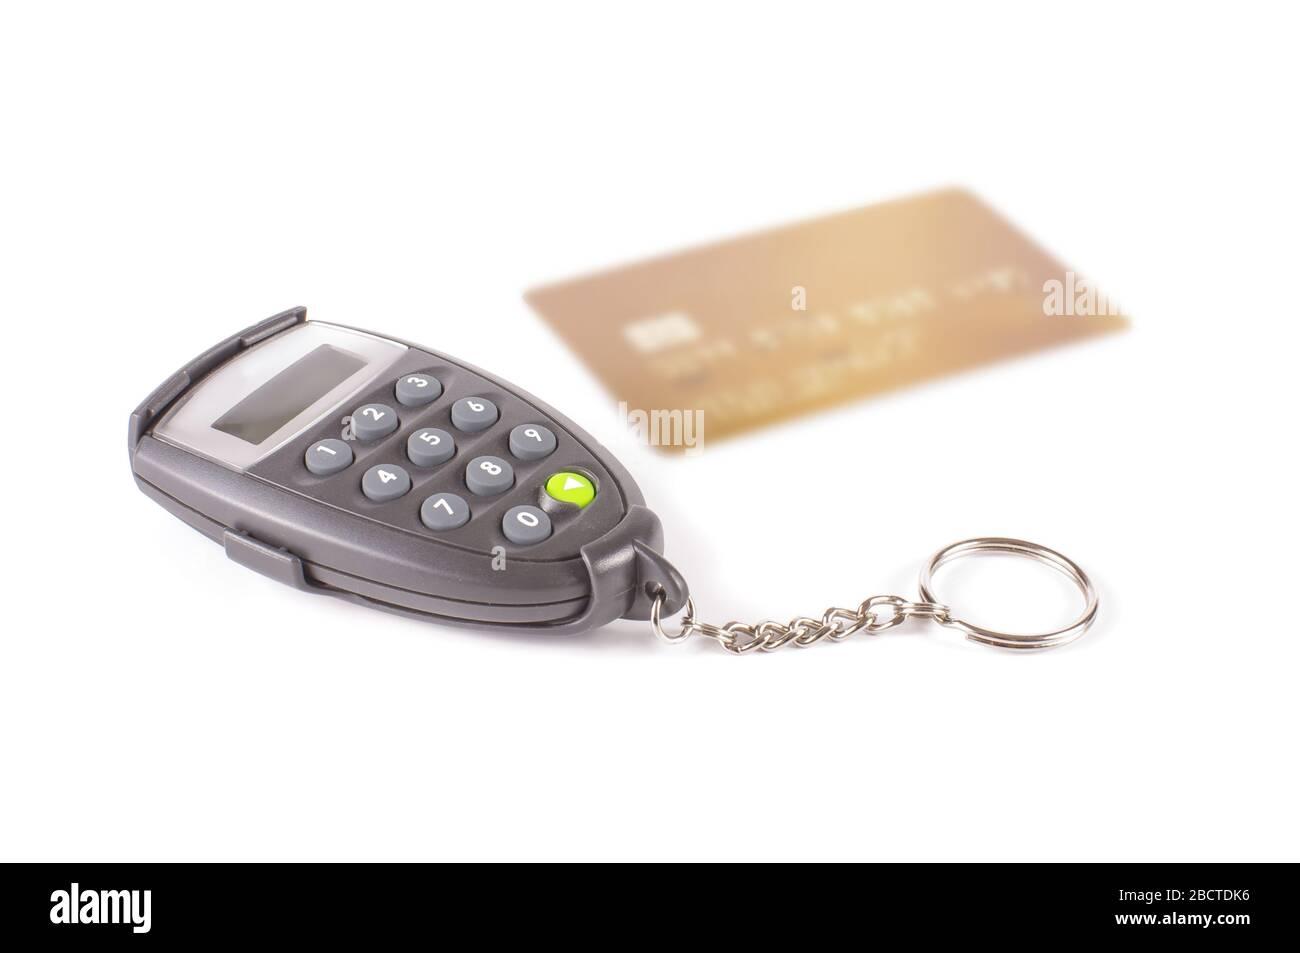 DIGIPASS y tarjeta de crédito aisladas sobre fondo blanco Foto de stock